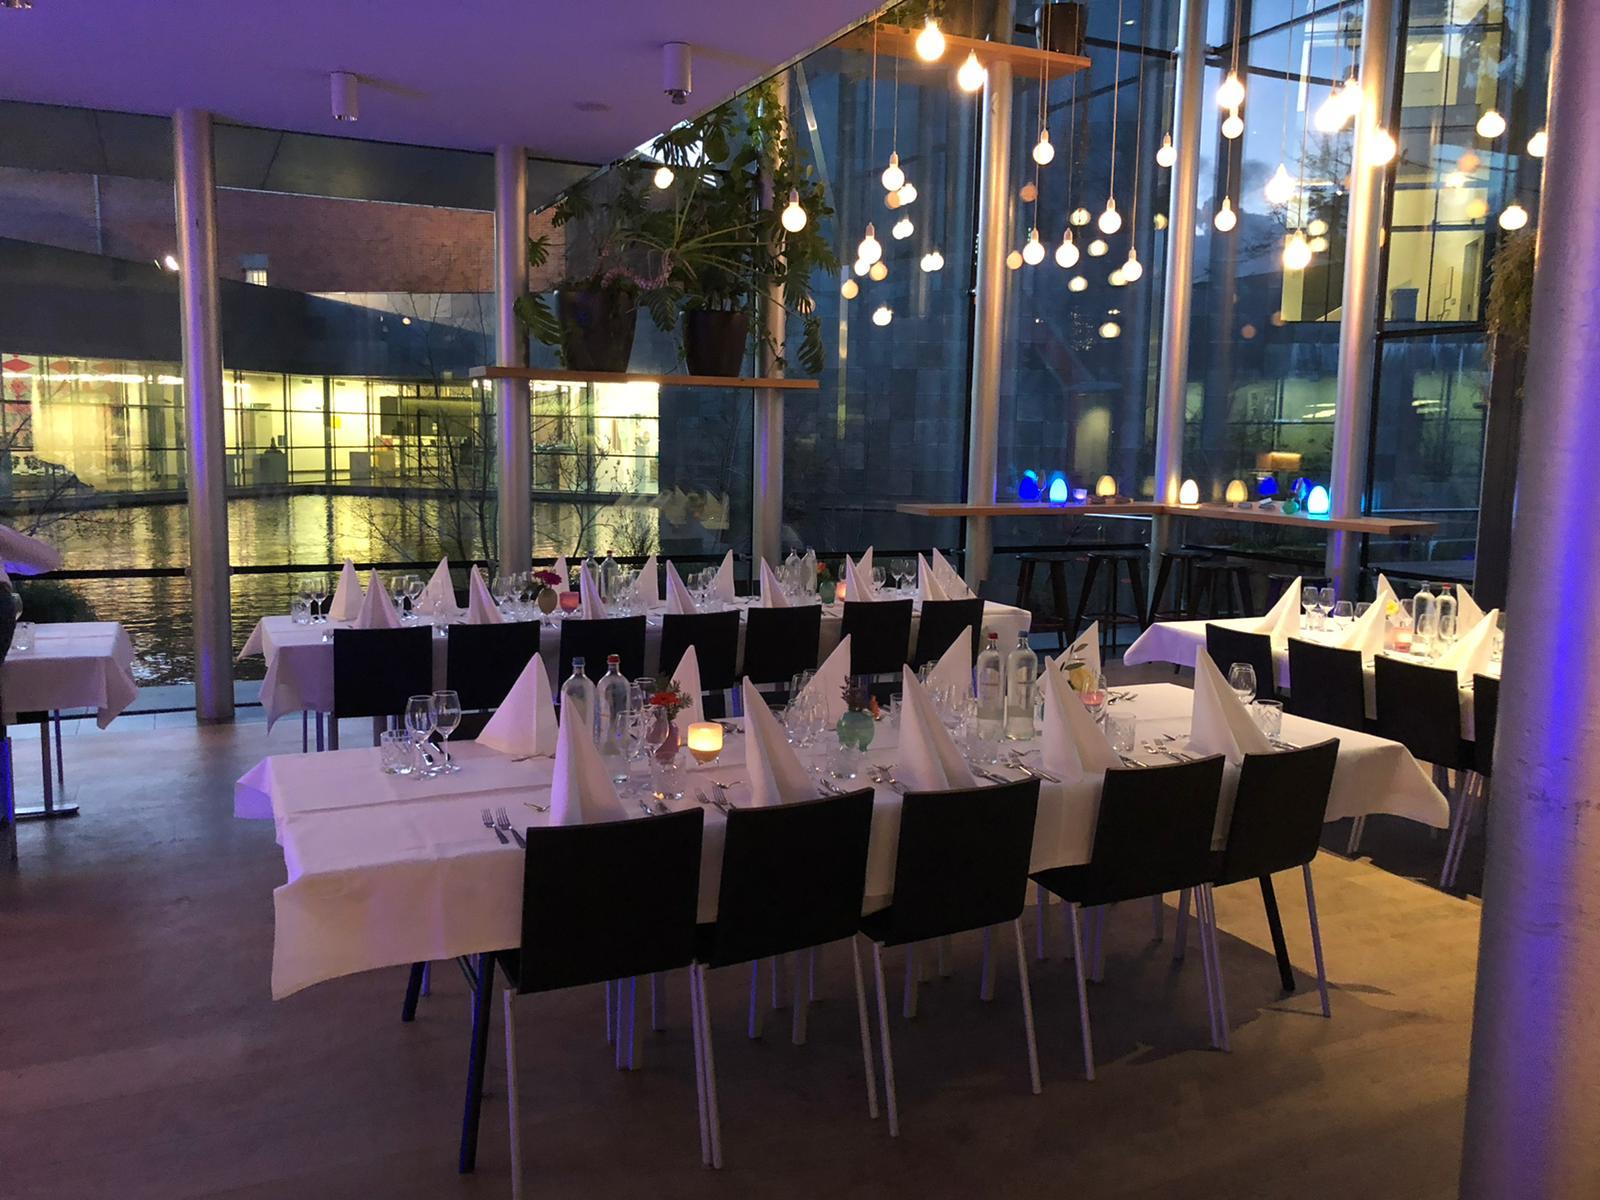 Diner arrangement groep Eindhoven